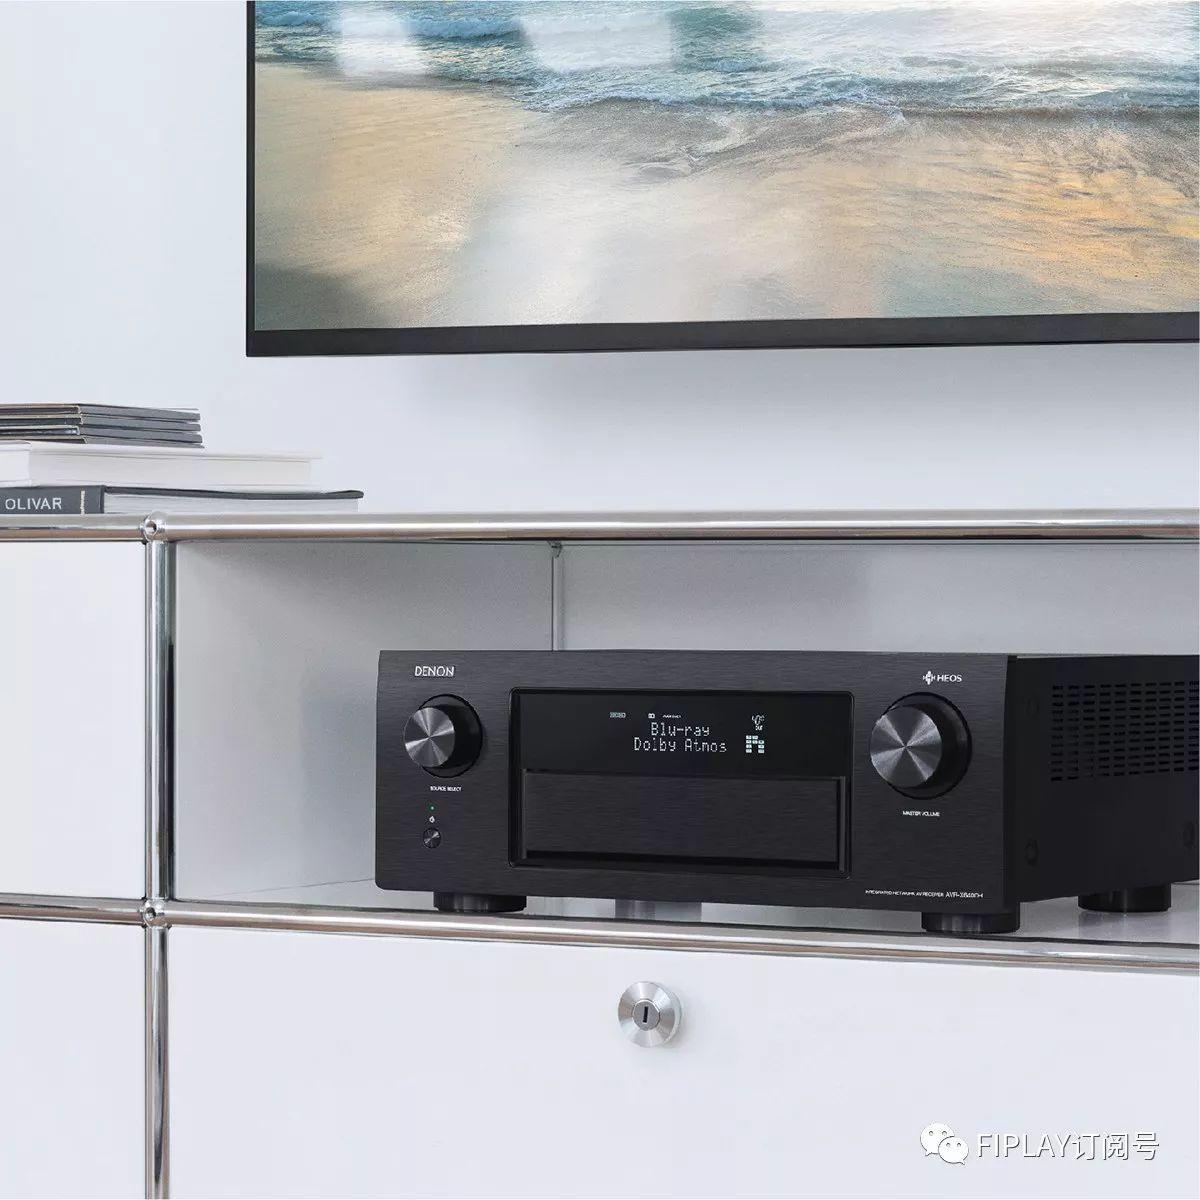 与Auro 3D、Dolby Atmos、DTS:X携手呈现——Denon AVR-X6400H和AVR